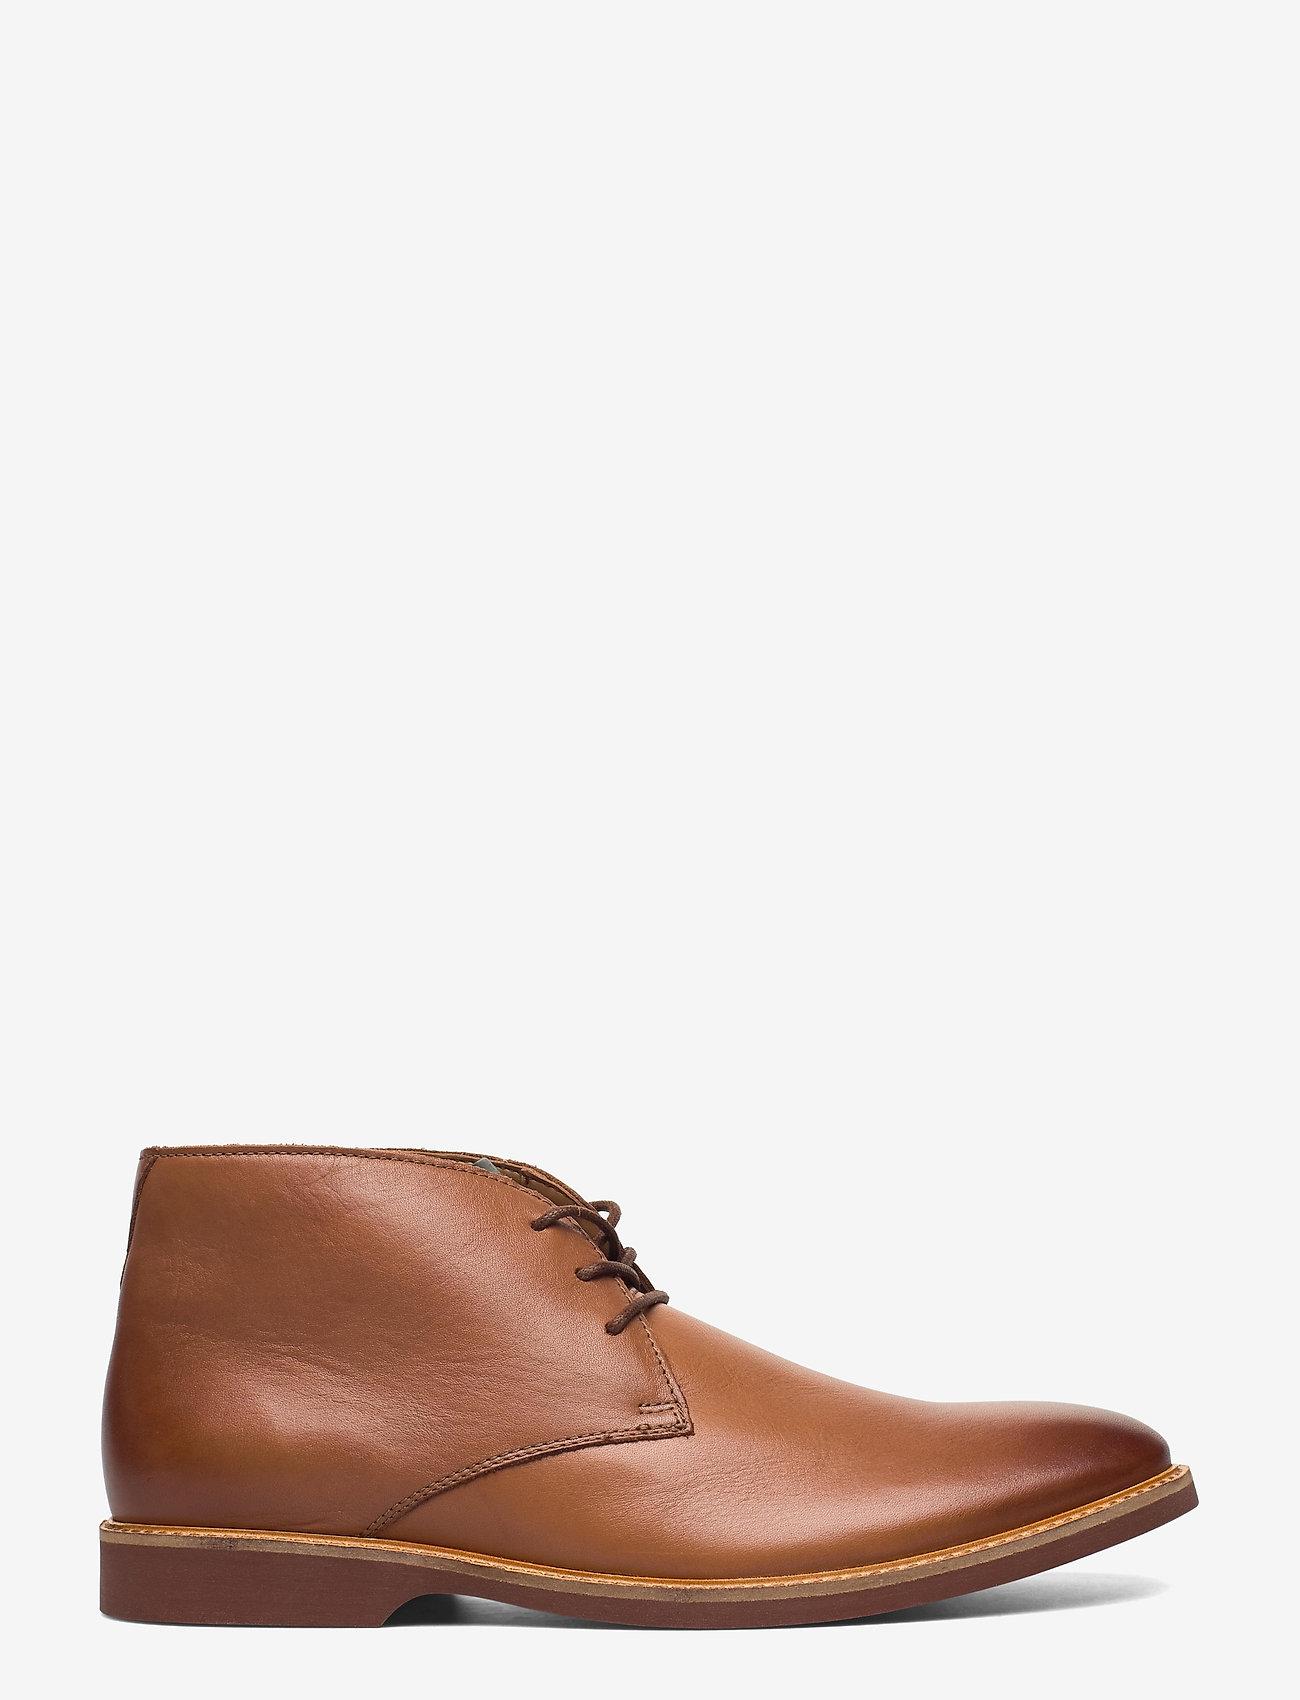 Clarks - Atticus Limit - desert boots - tan leather - 1